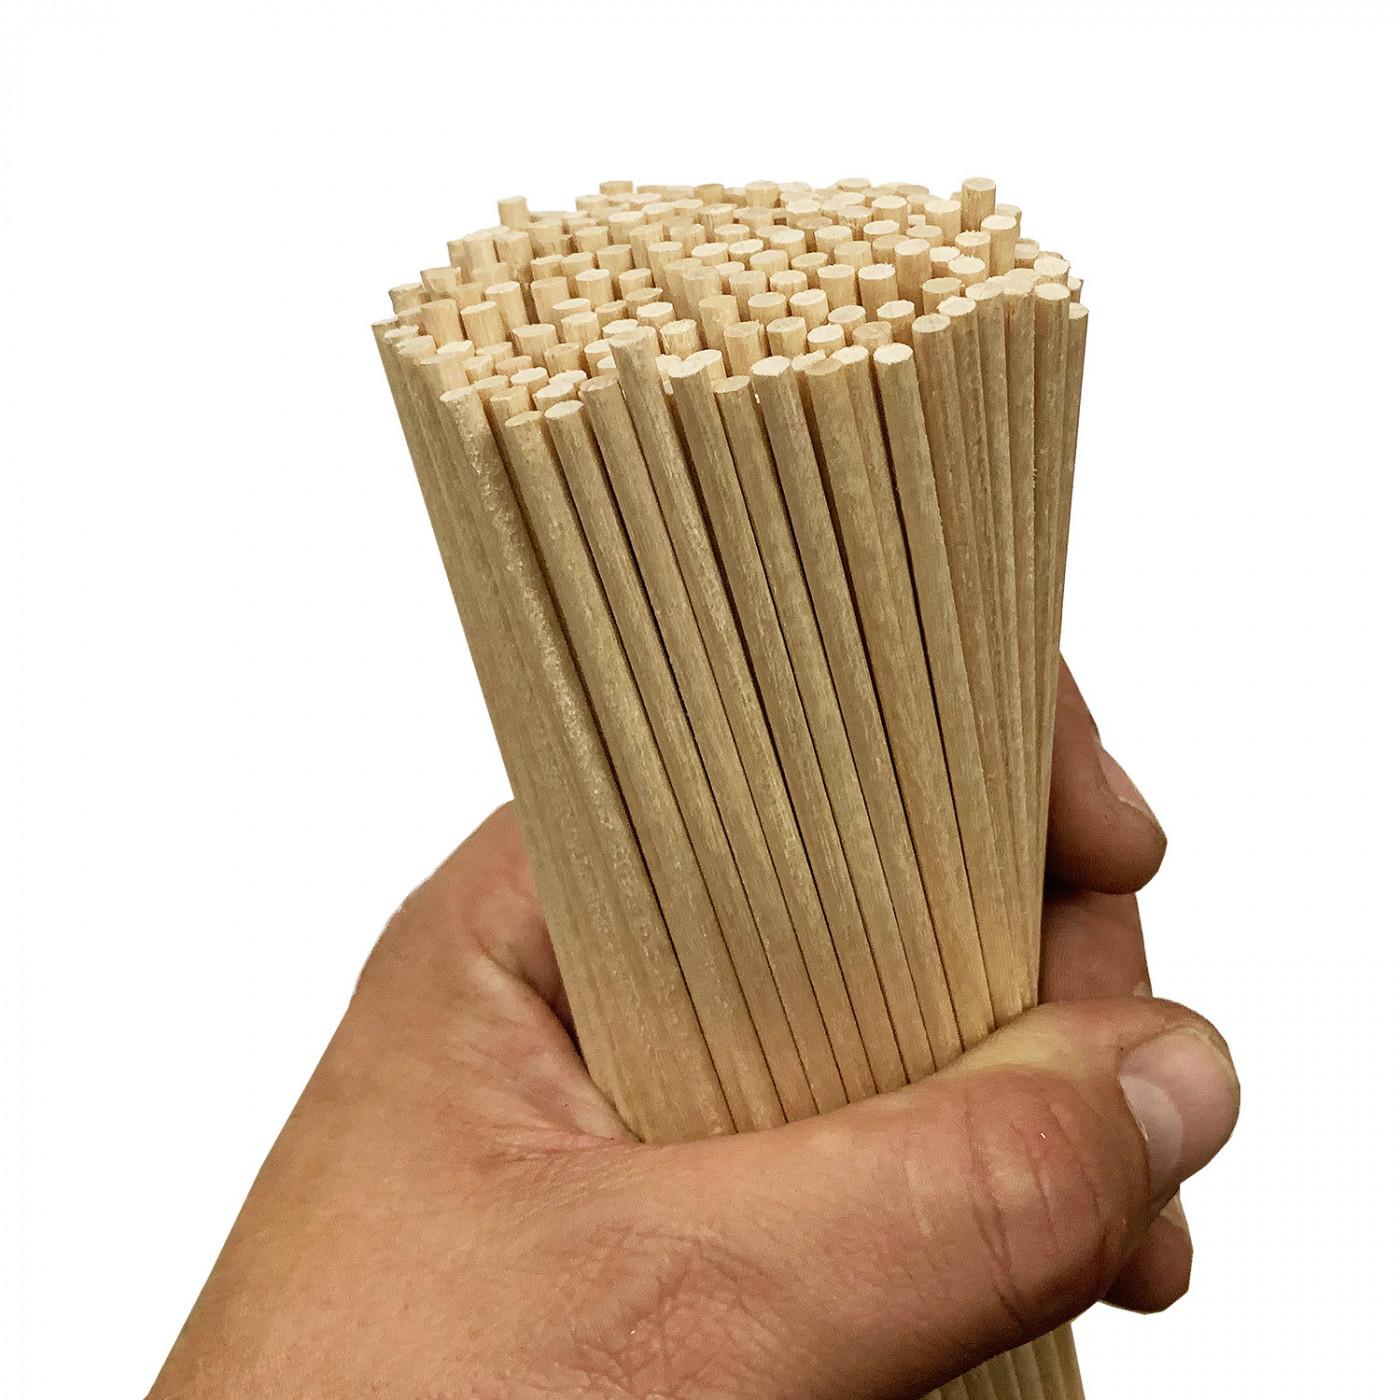 Set of 200 wooden sticks (4 mm x 30 cm, birch wood)